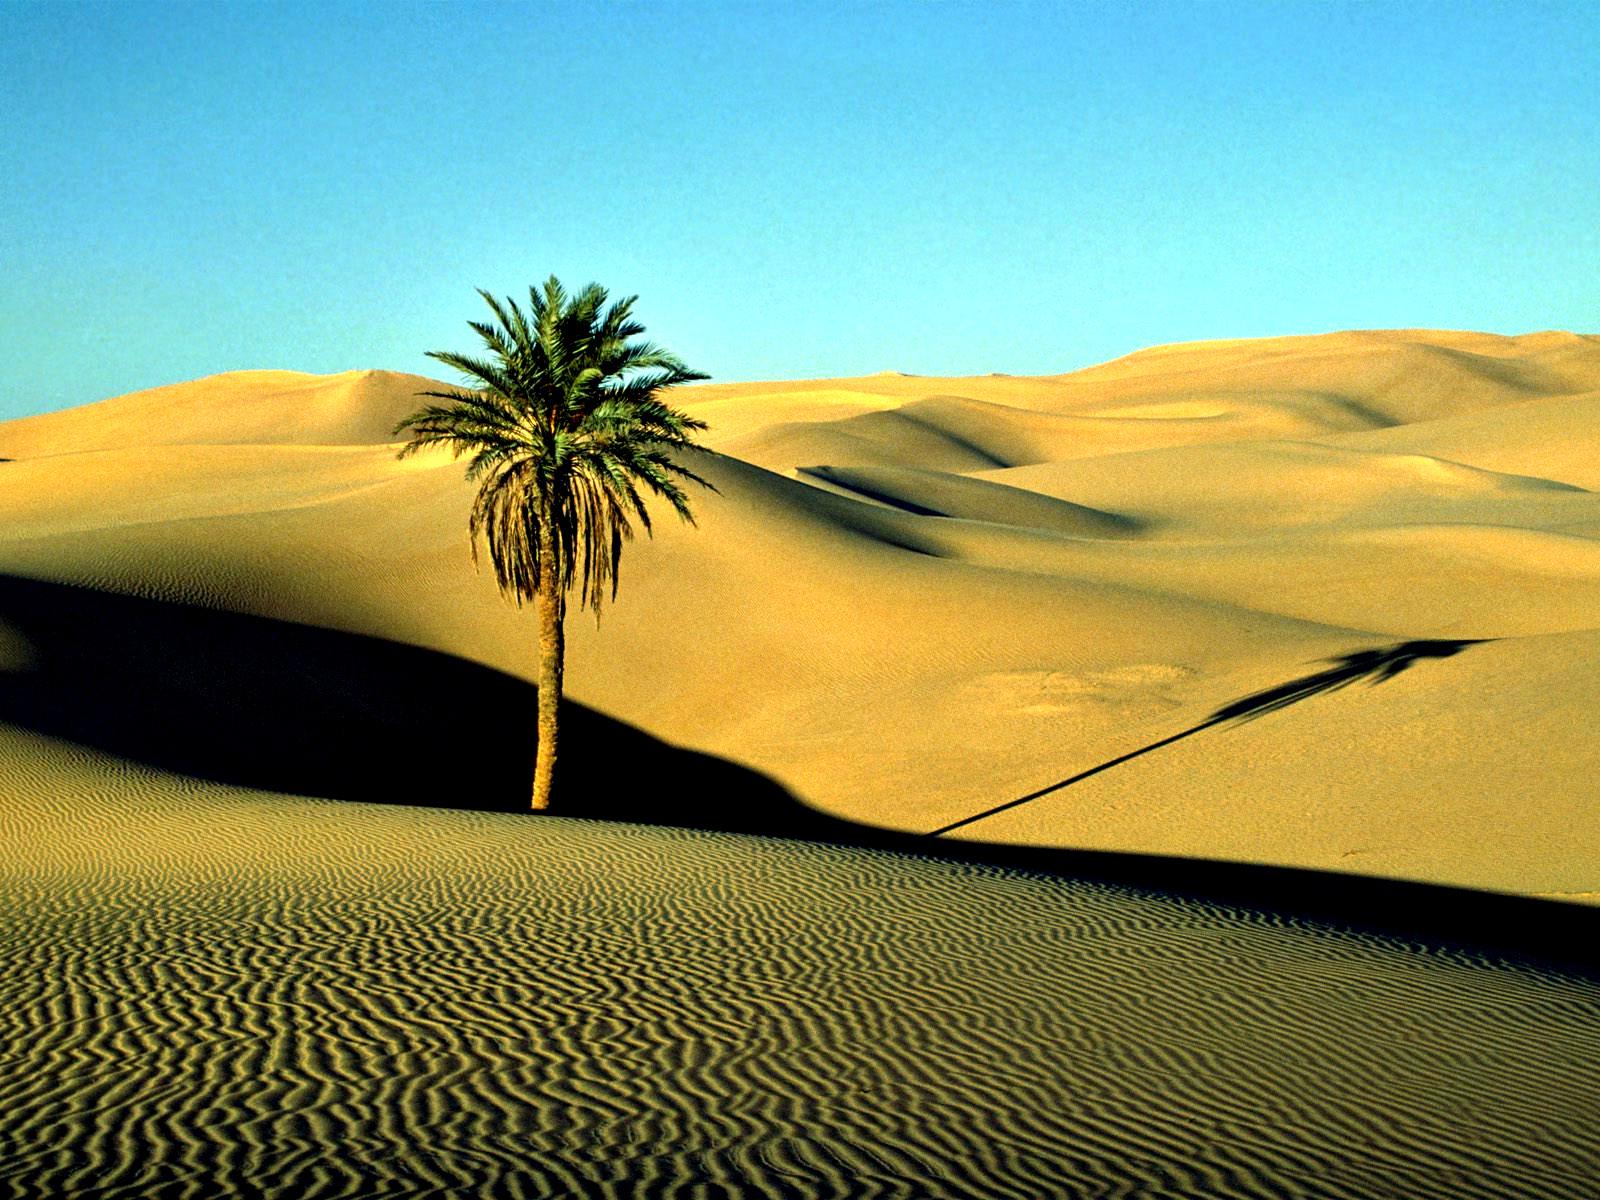 File:Sahara. Libya.jpg - Wikimedia Commons